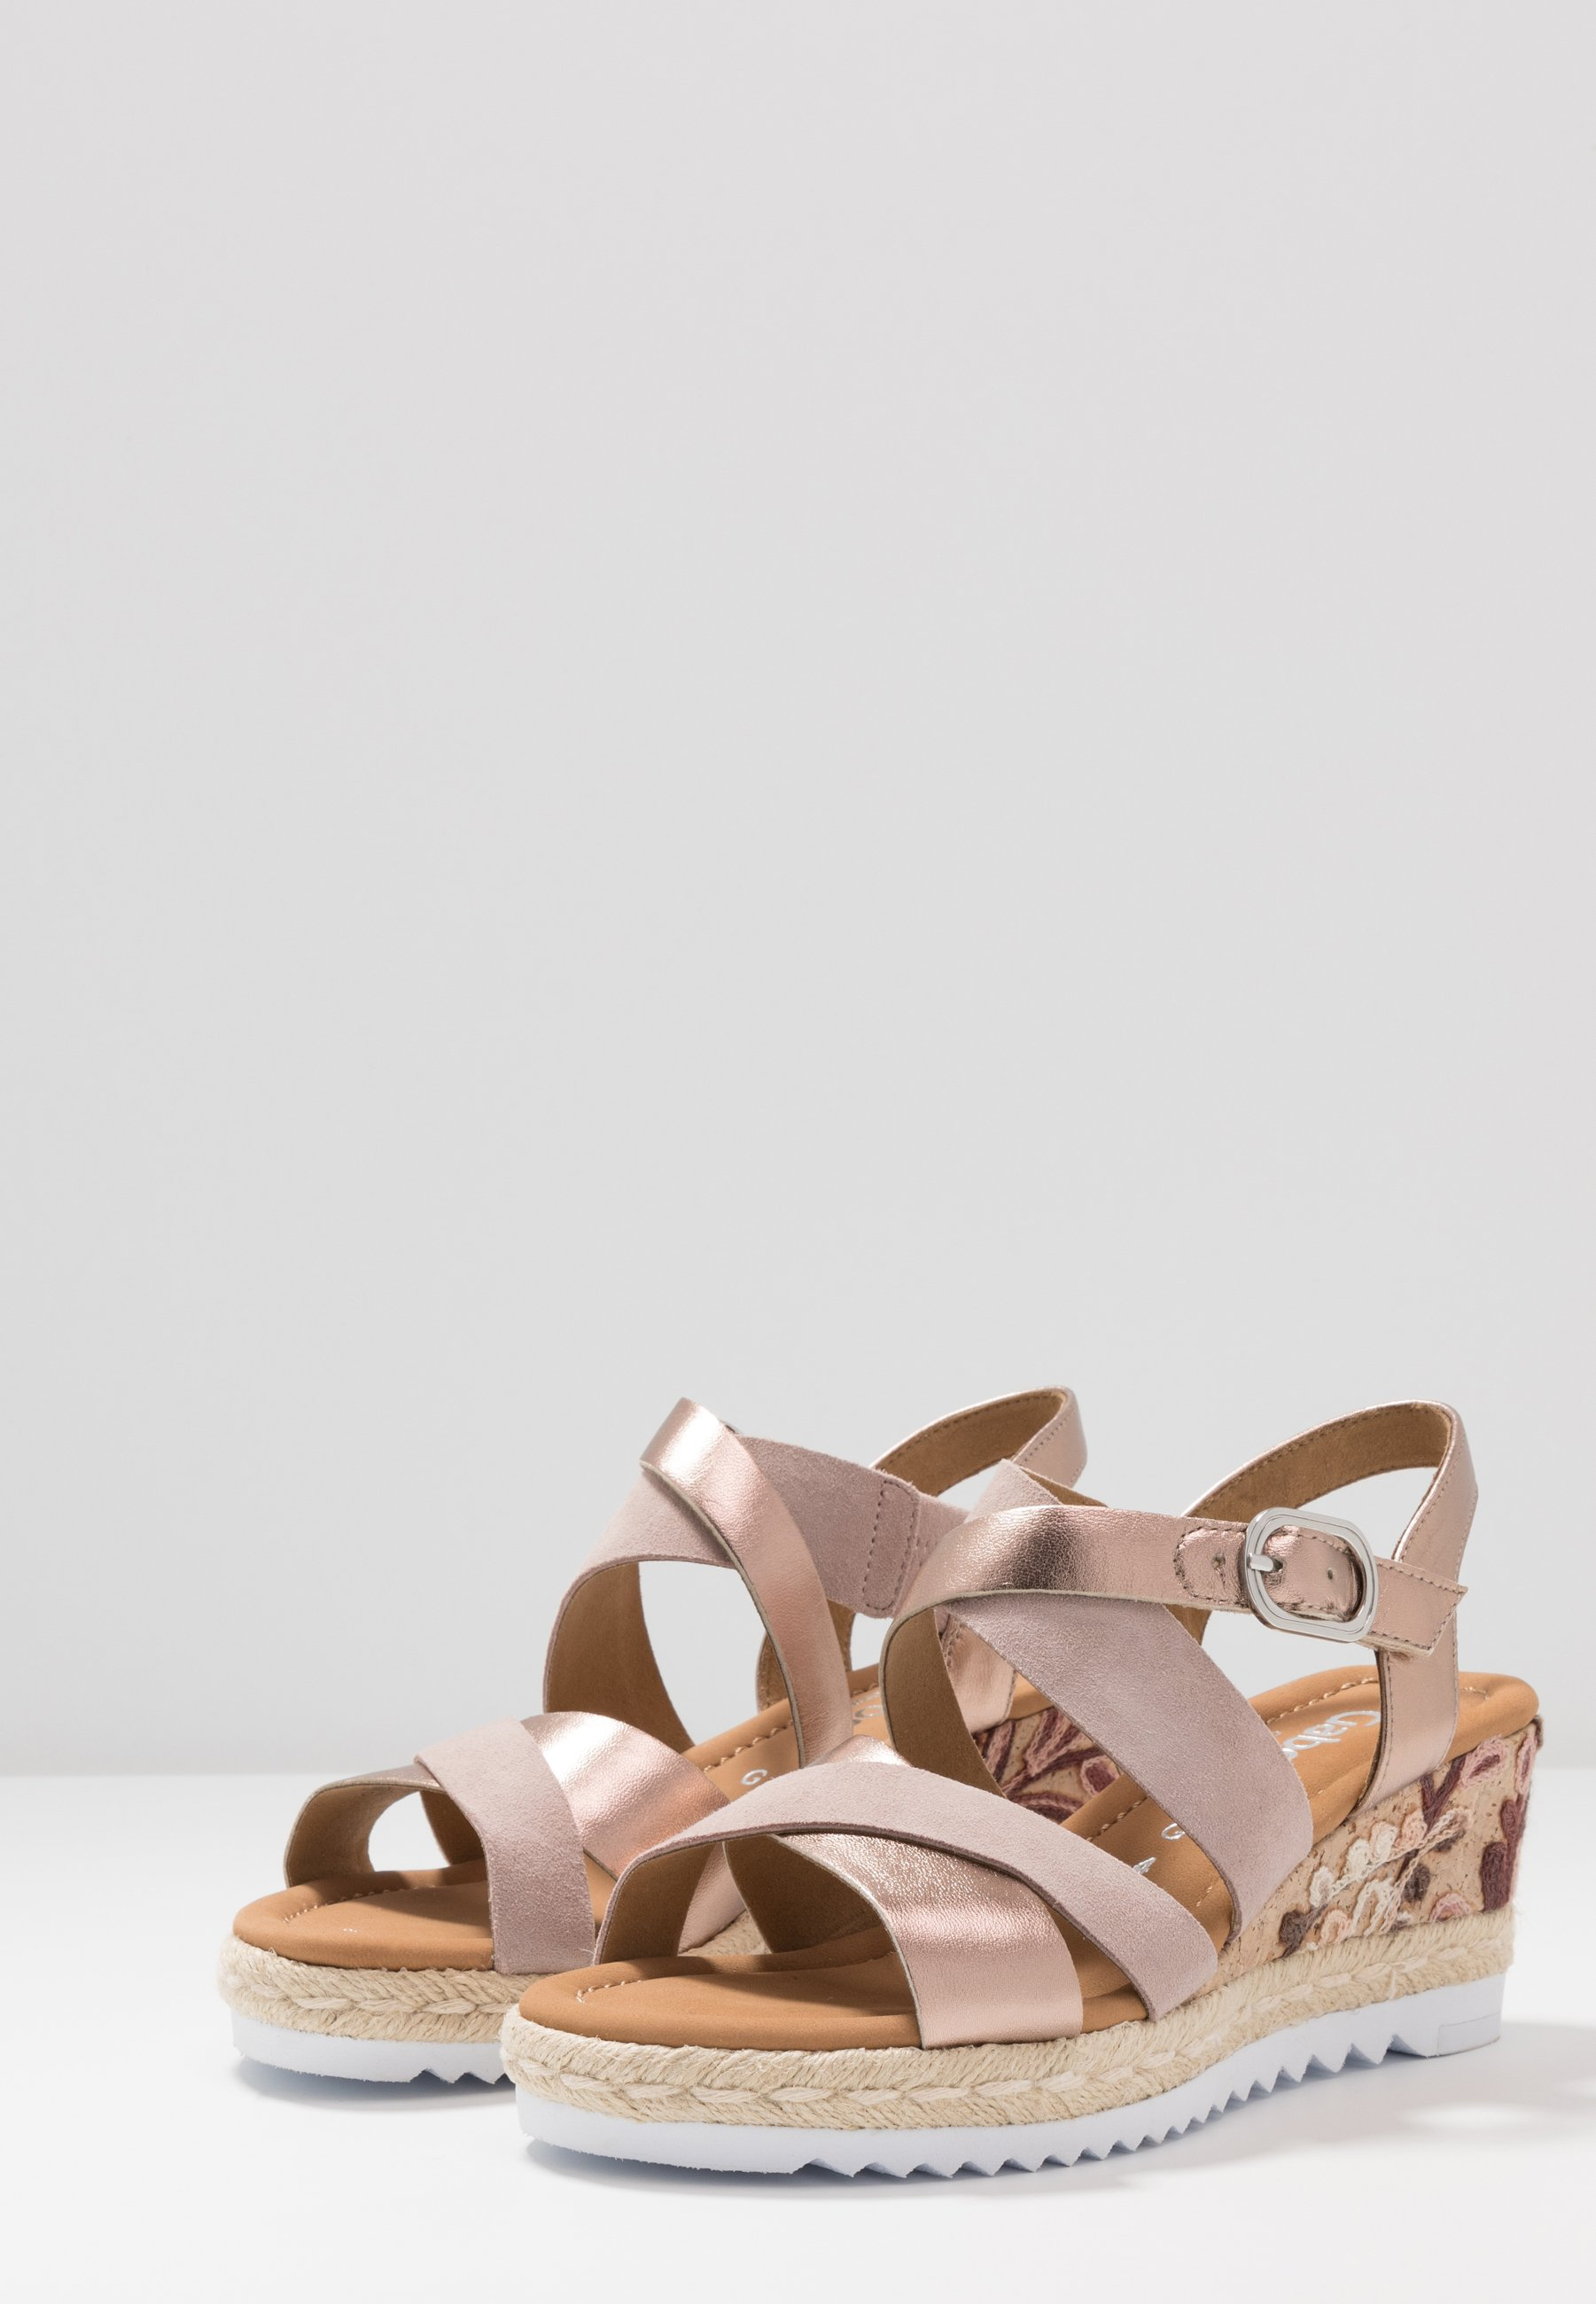 Gabor Comfort Plateausandalette luxor metallic/rame rose/roségoldfarben